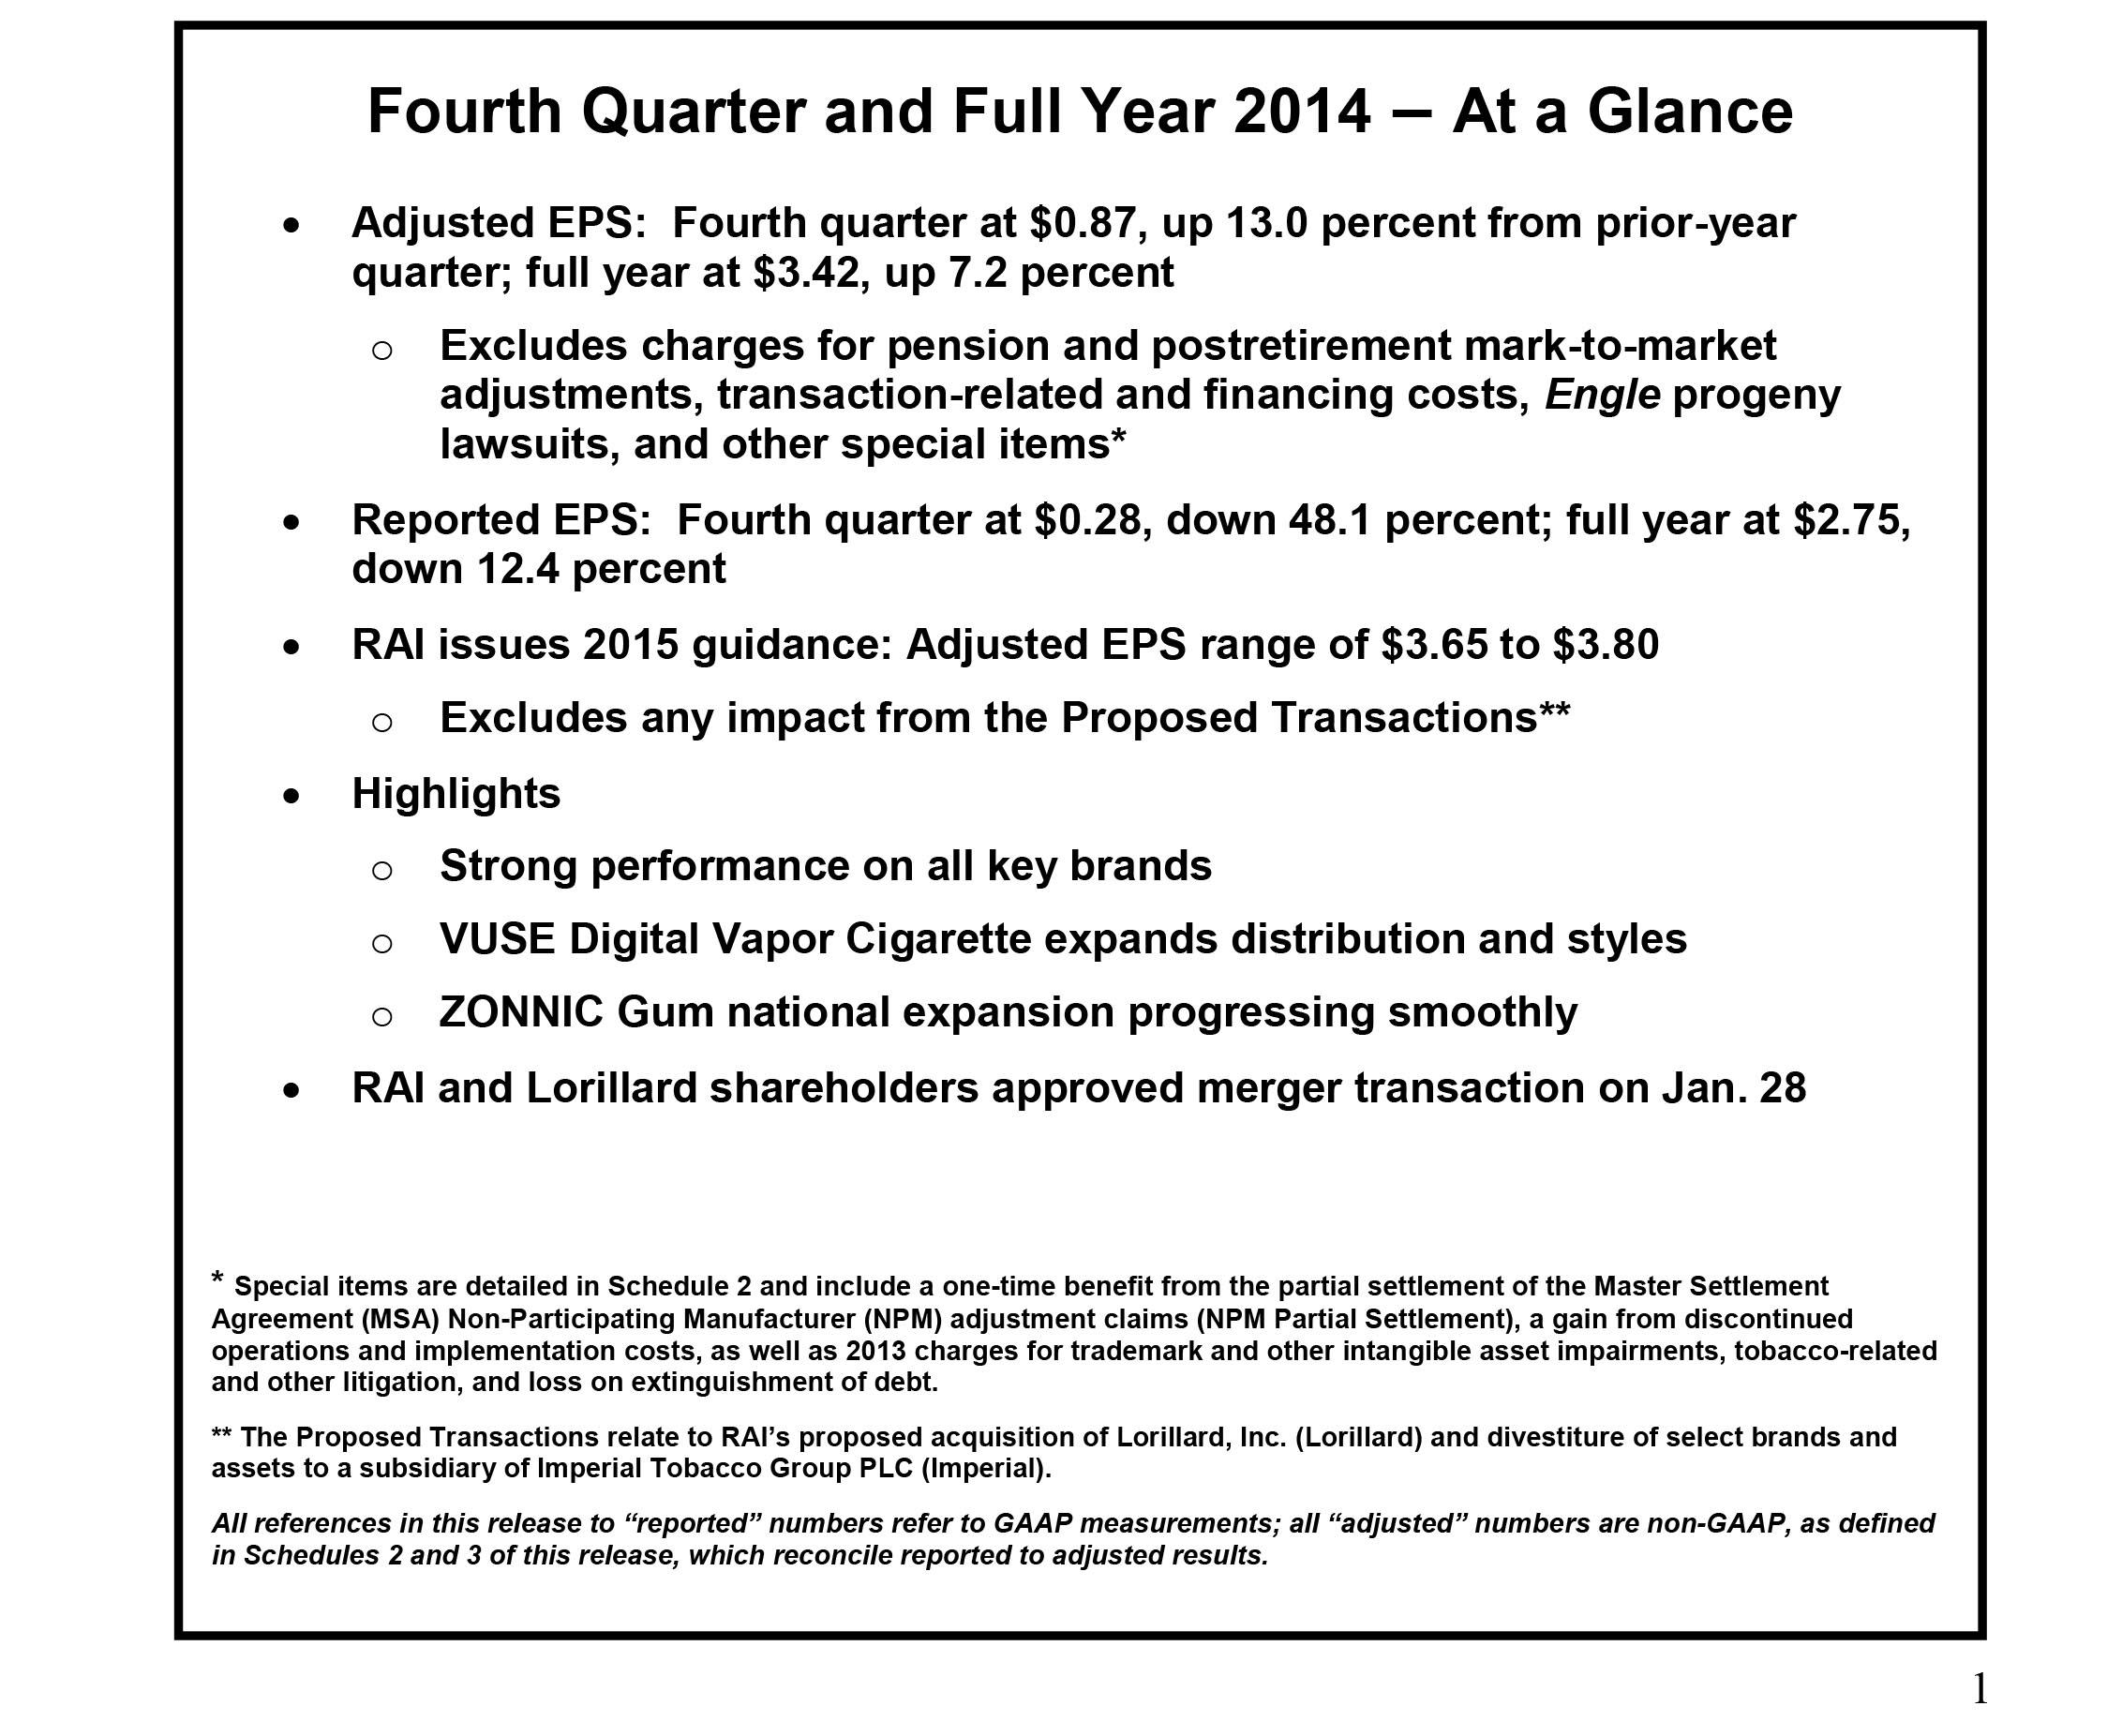 Reynolds american incorporated rai finishes strong year with 4q14 rai finishes strong year with 4q14 growth momentum issues 2015 eps guidance platinumwayz